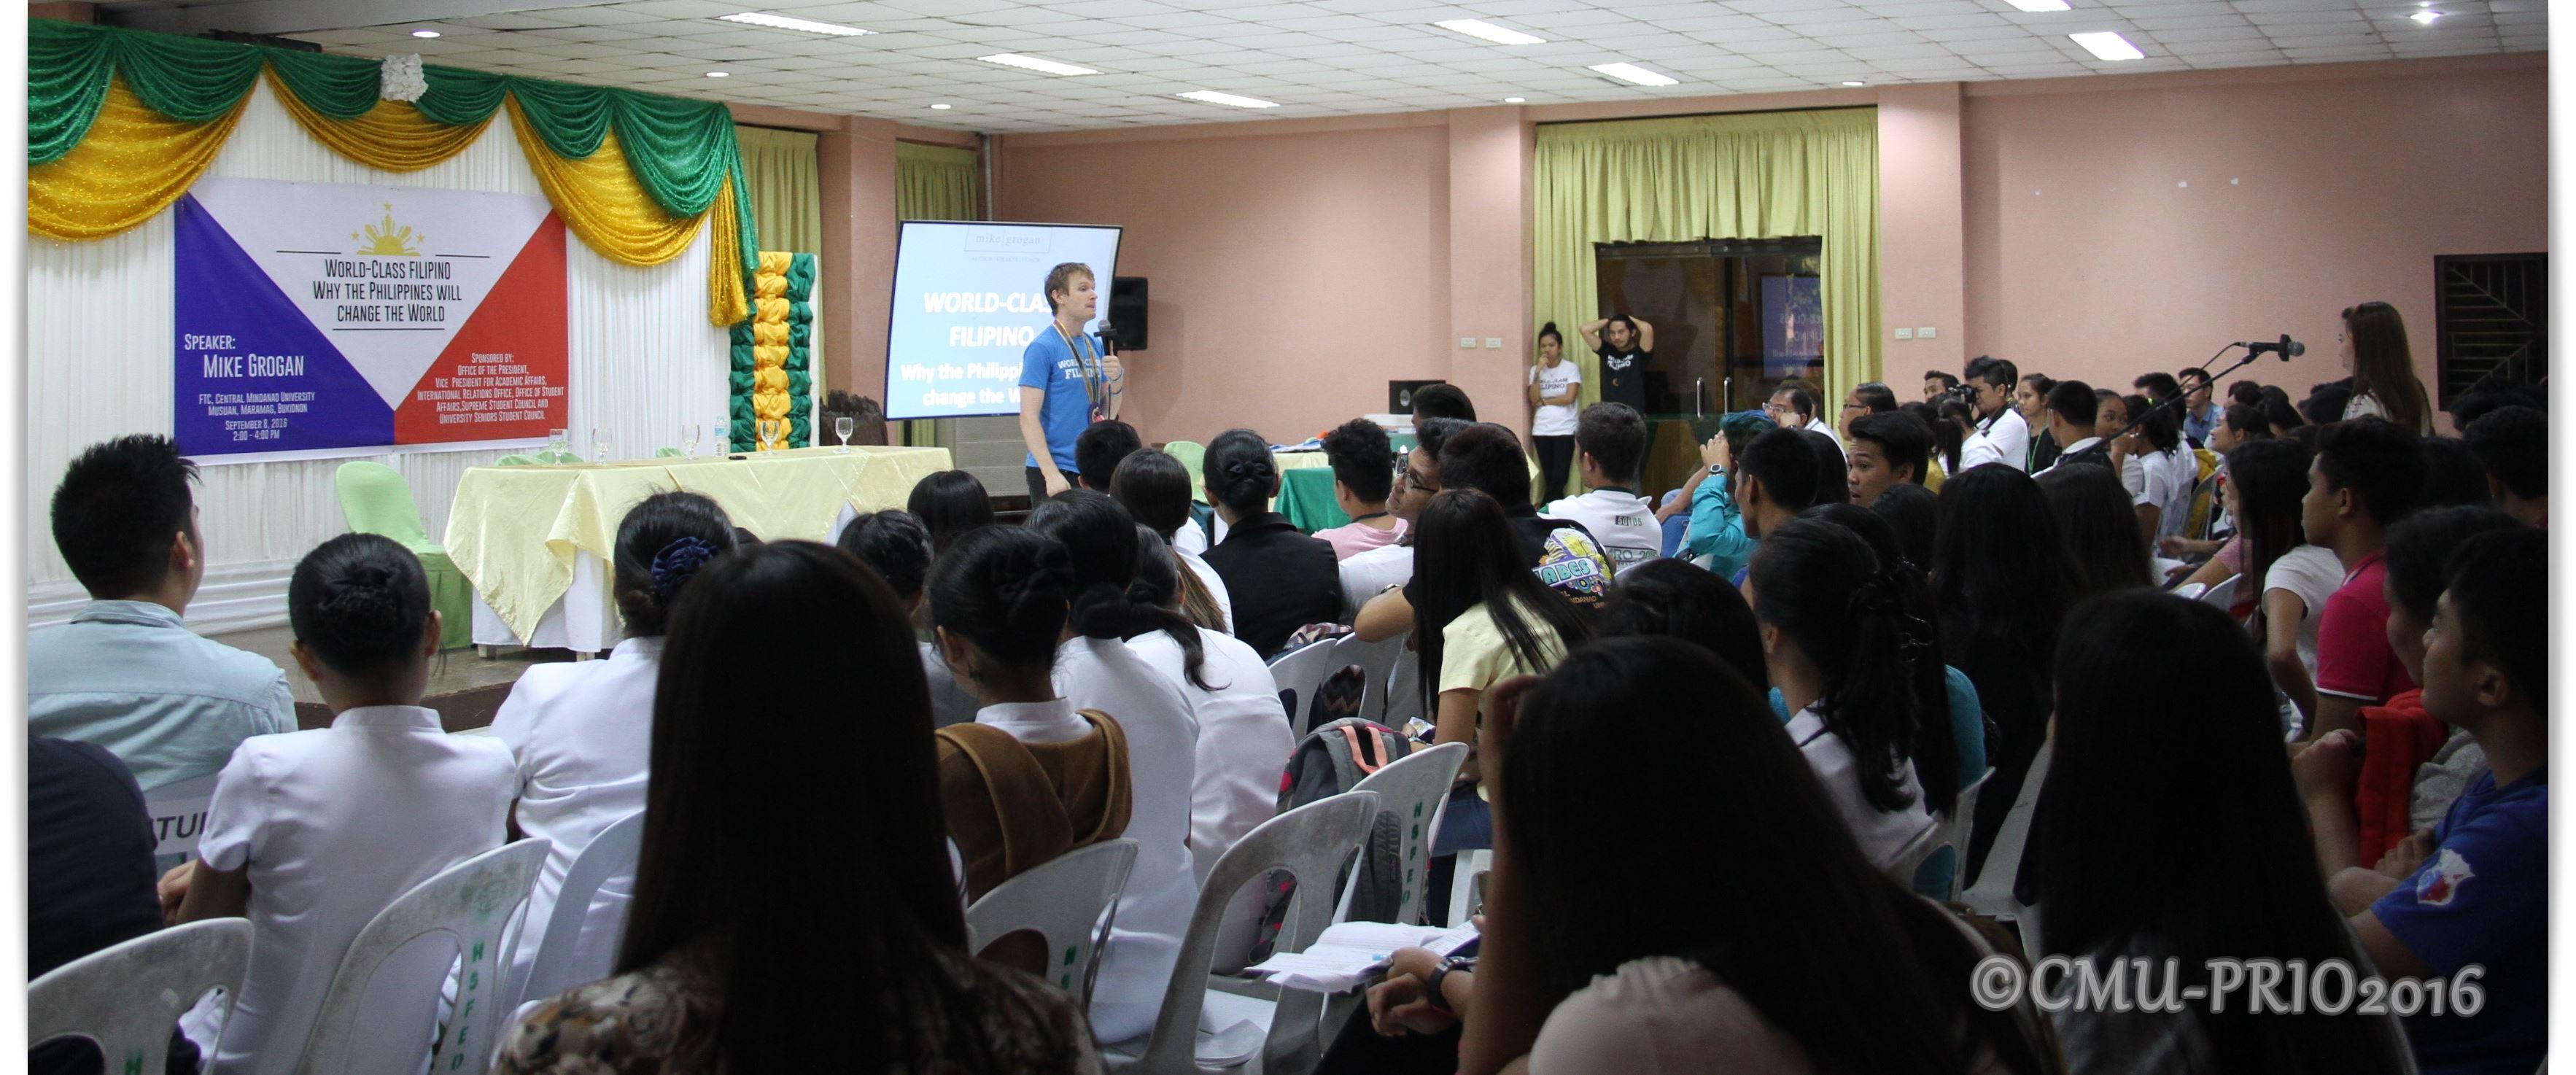 World Class Filipino